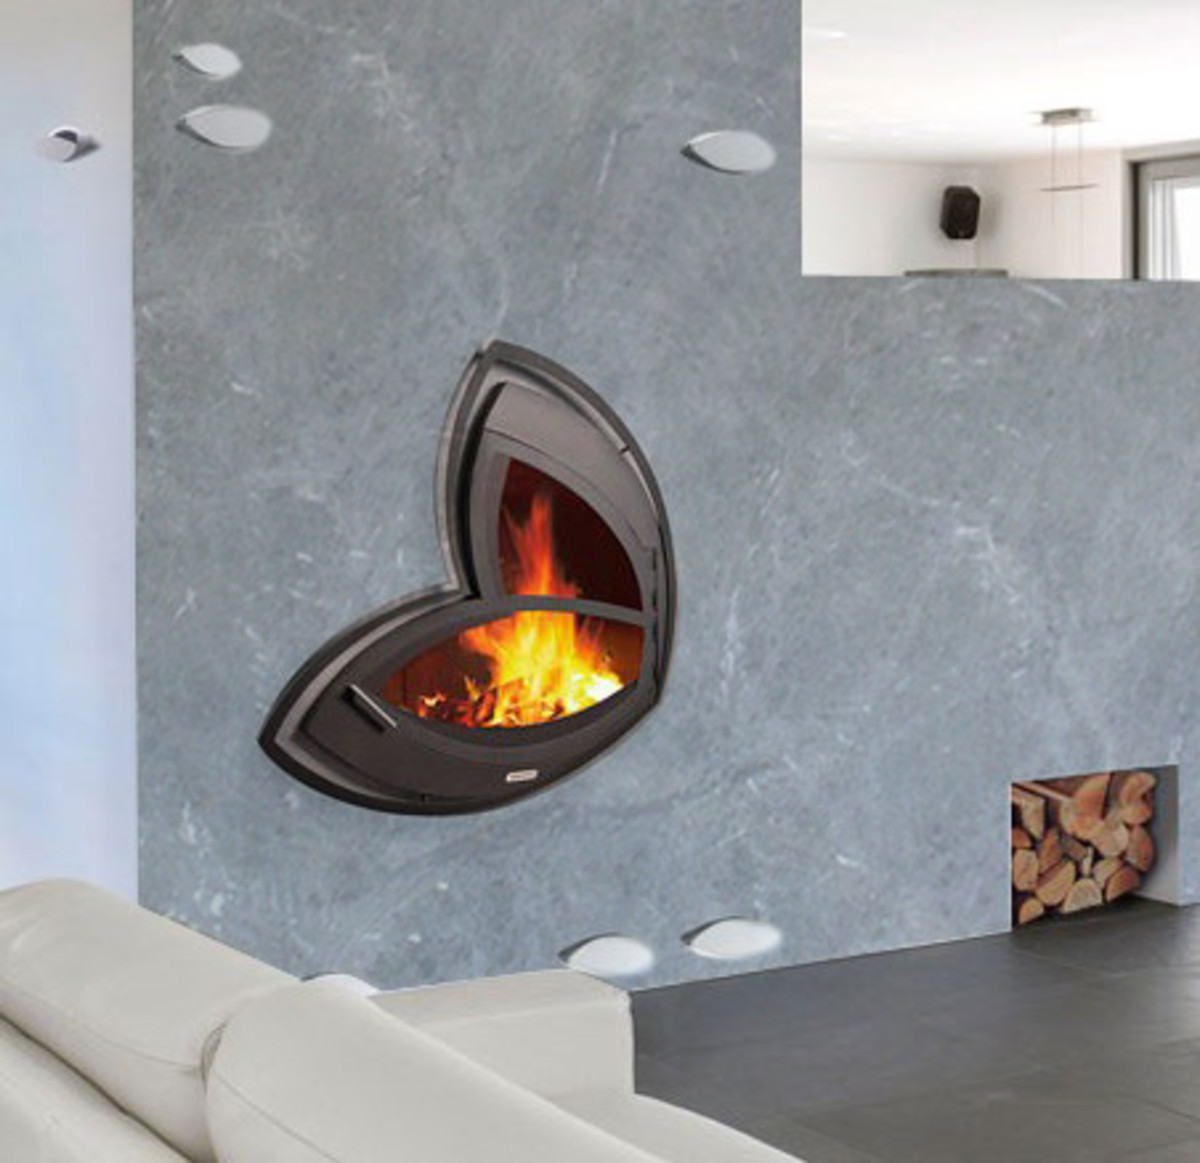 Edgy Asymmetrical Fireplaces